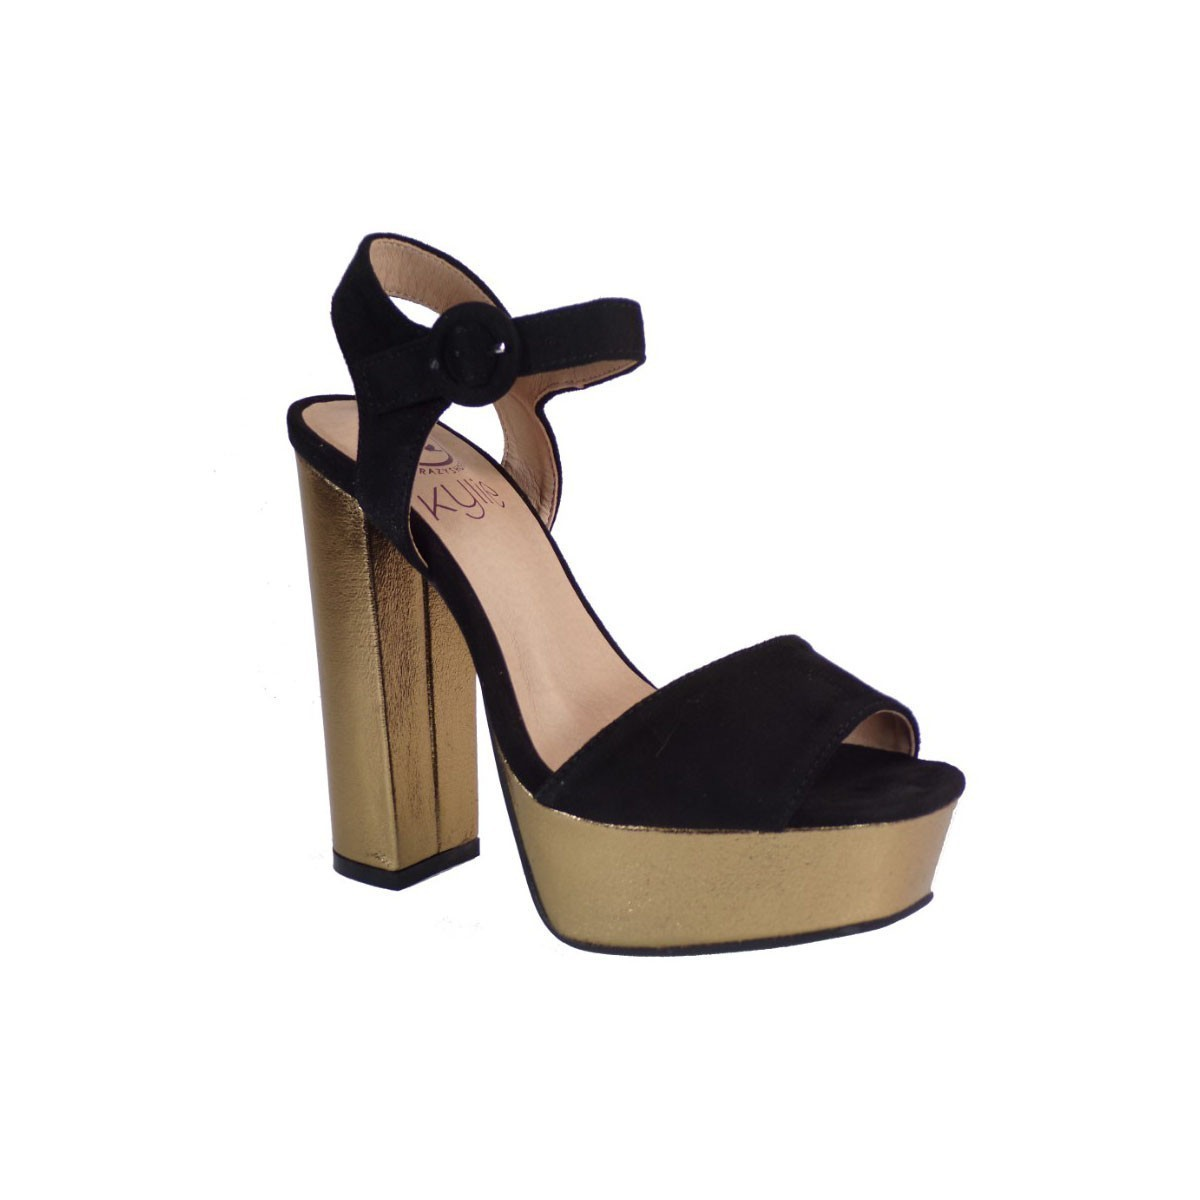 Kylie Shoes Γυναικεία Πέδιλα K1702001 Μαύρο